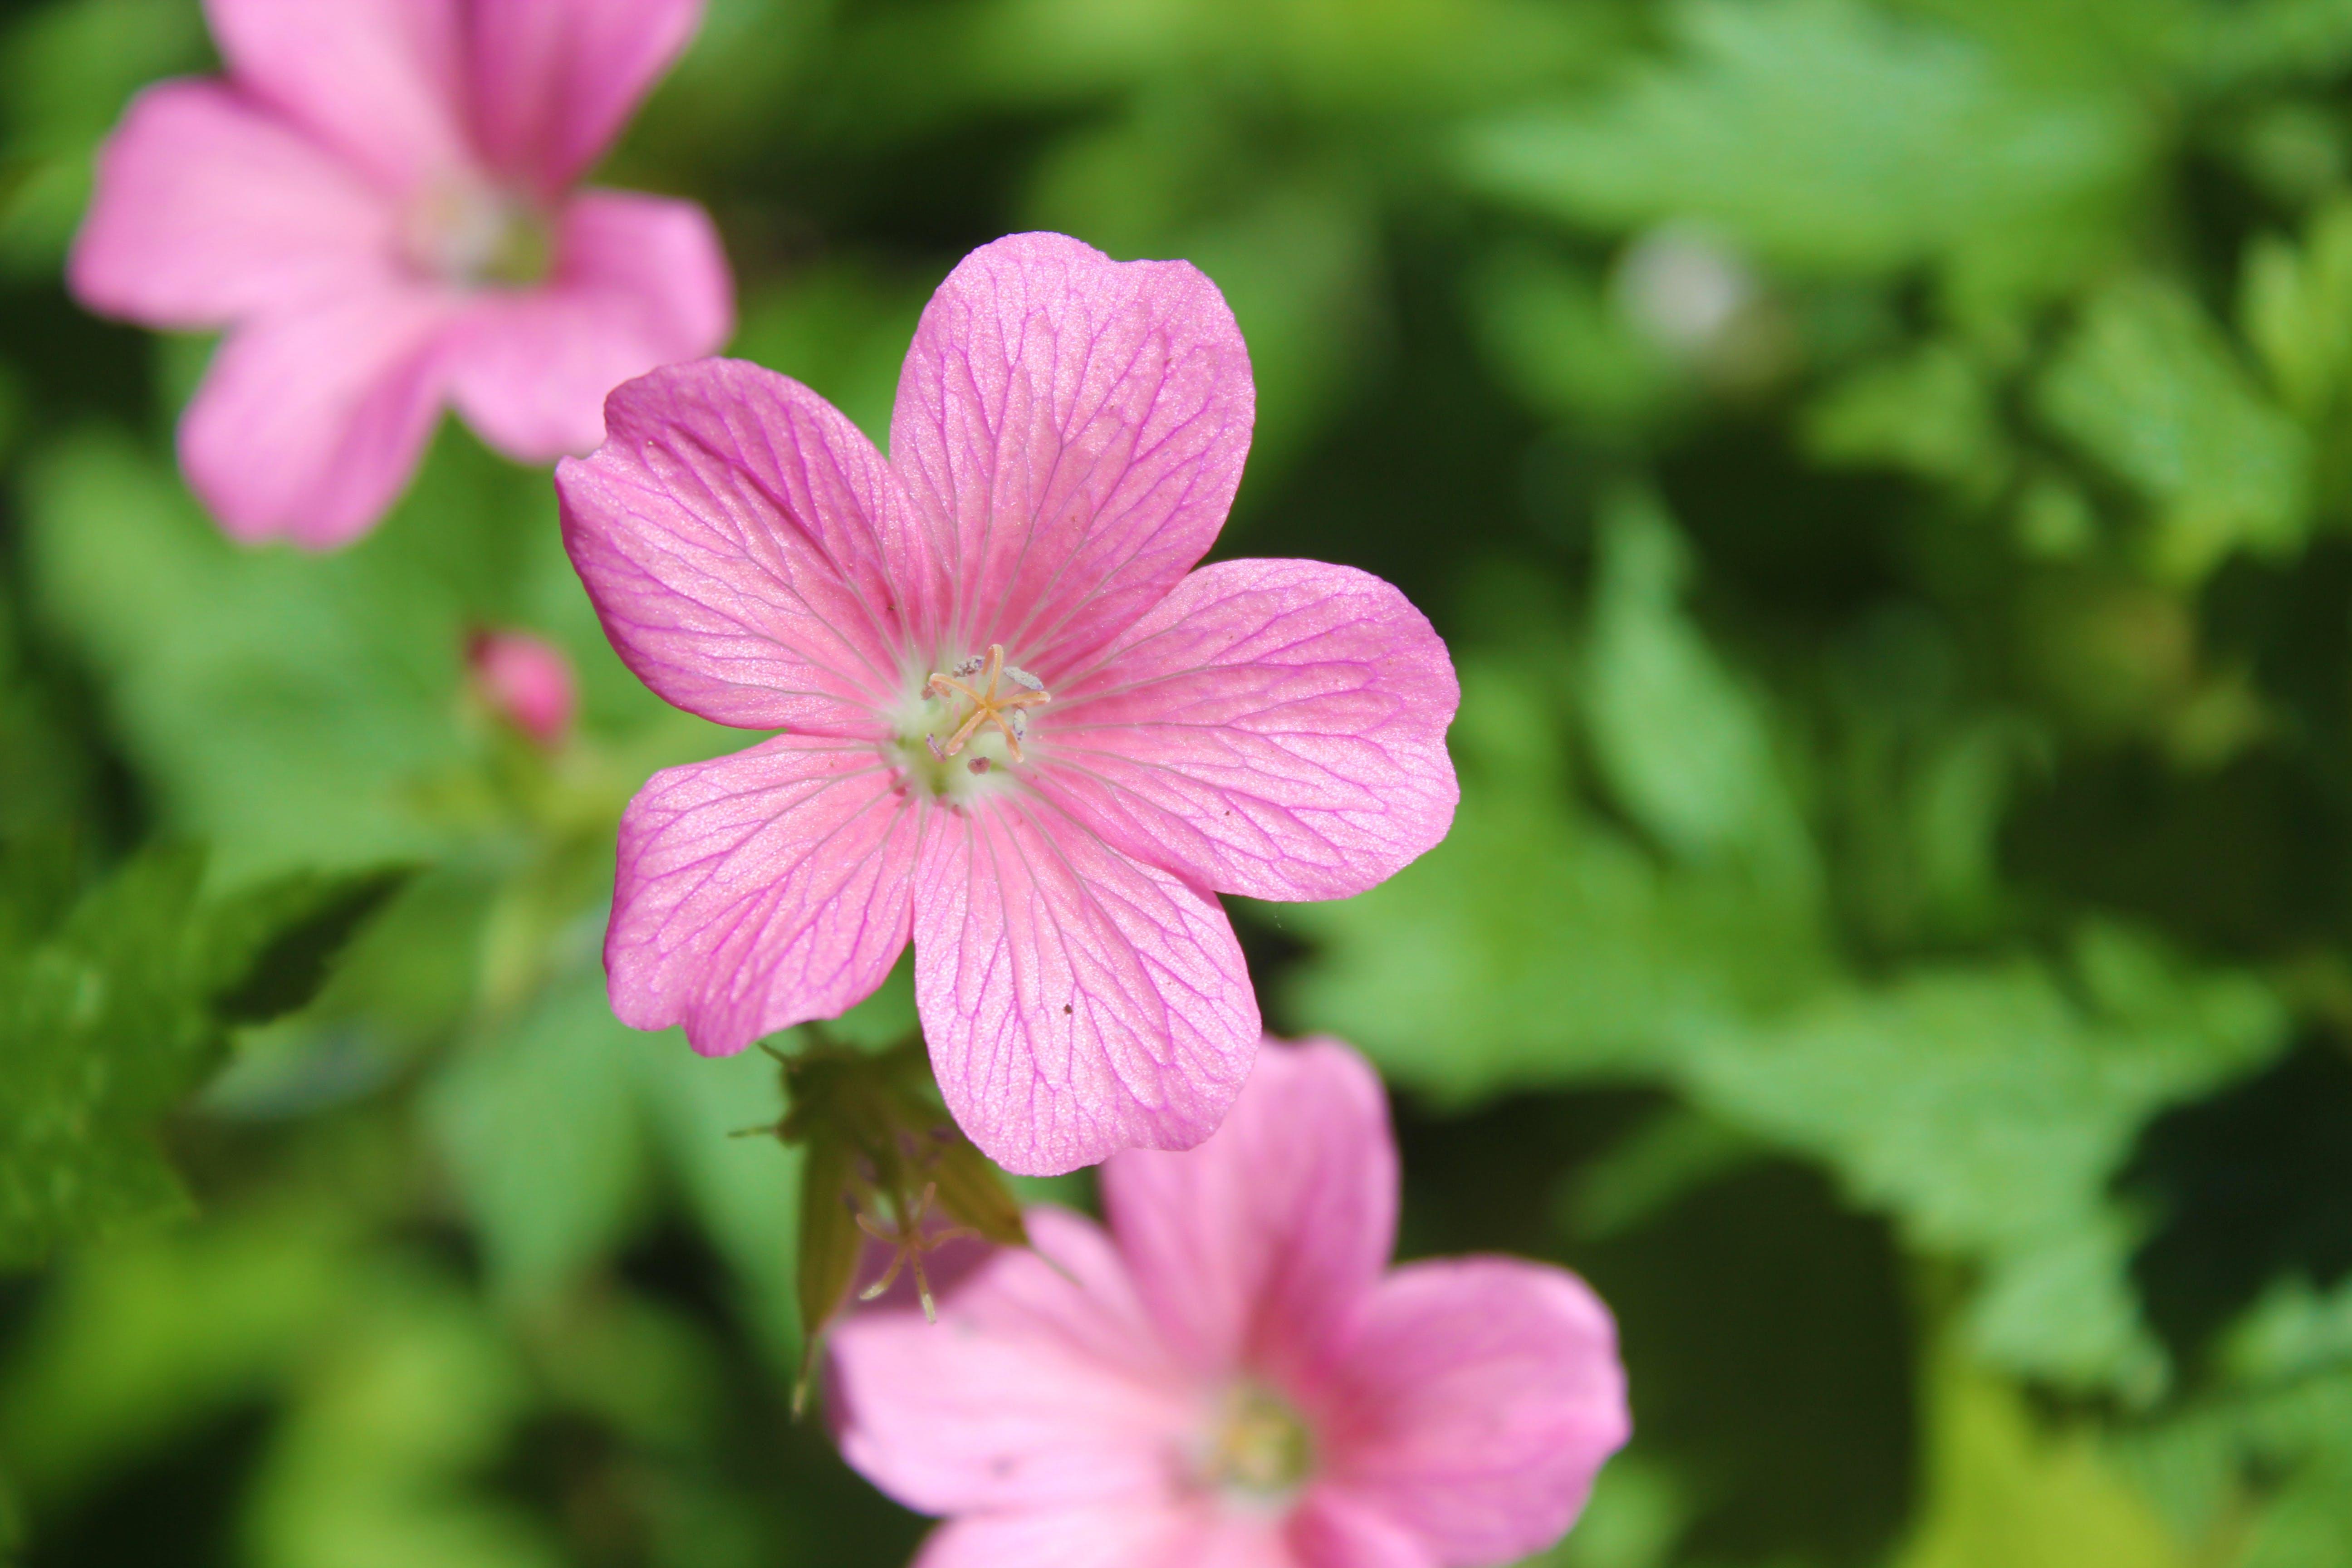 Free stock photo of pink daisy